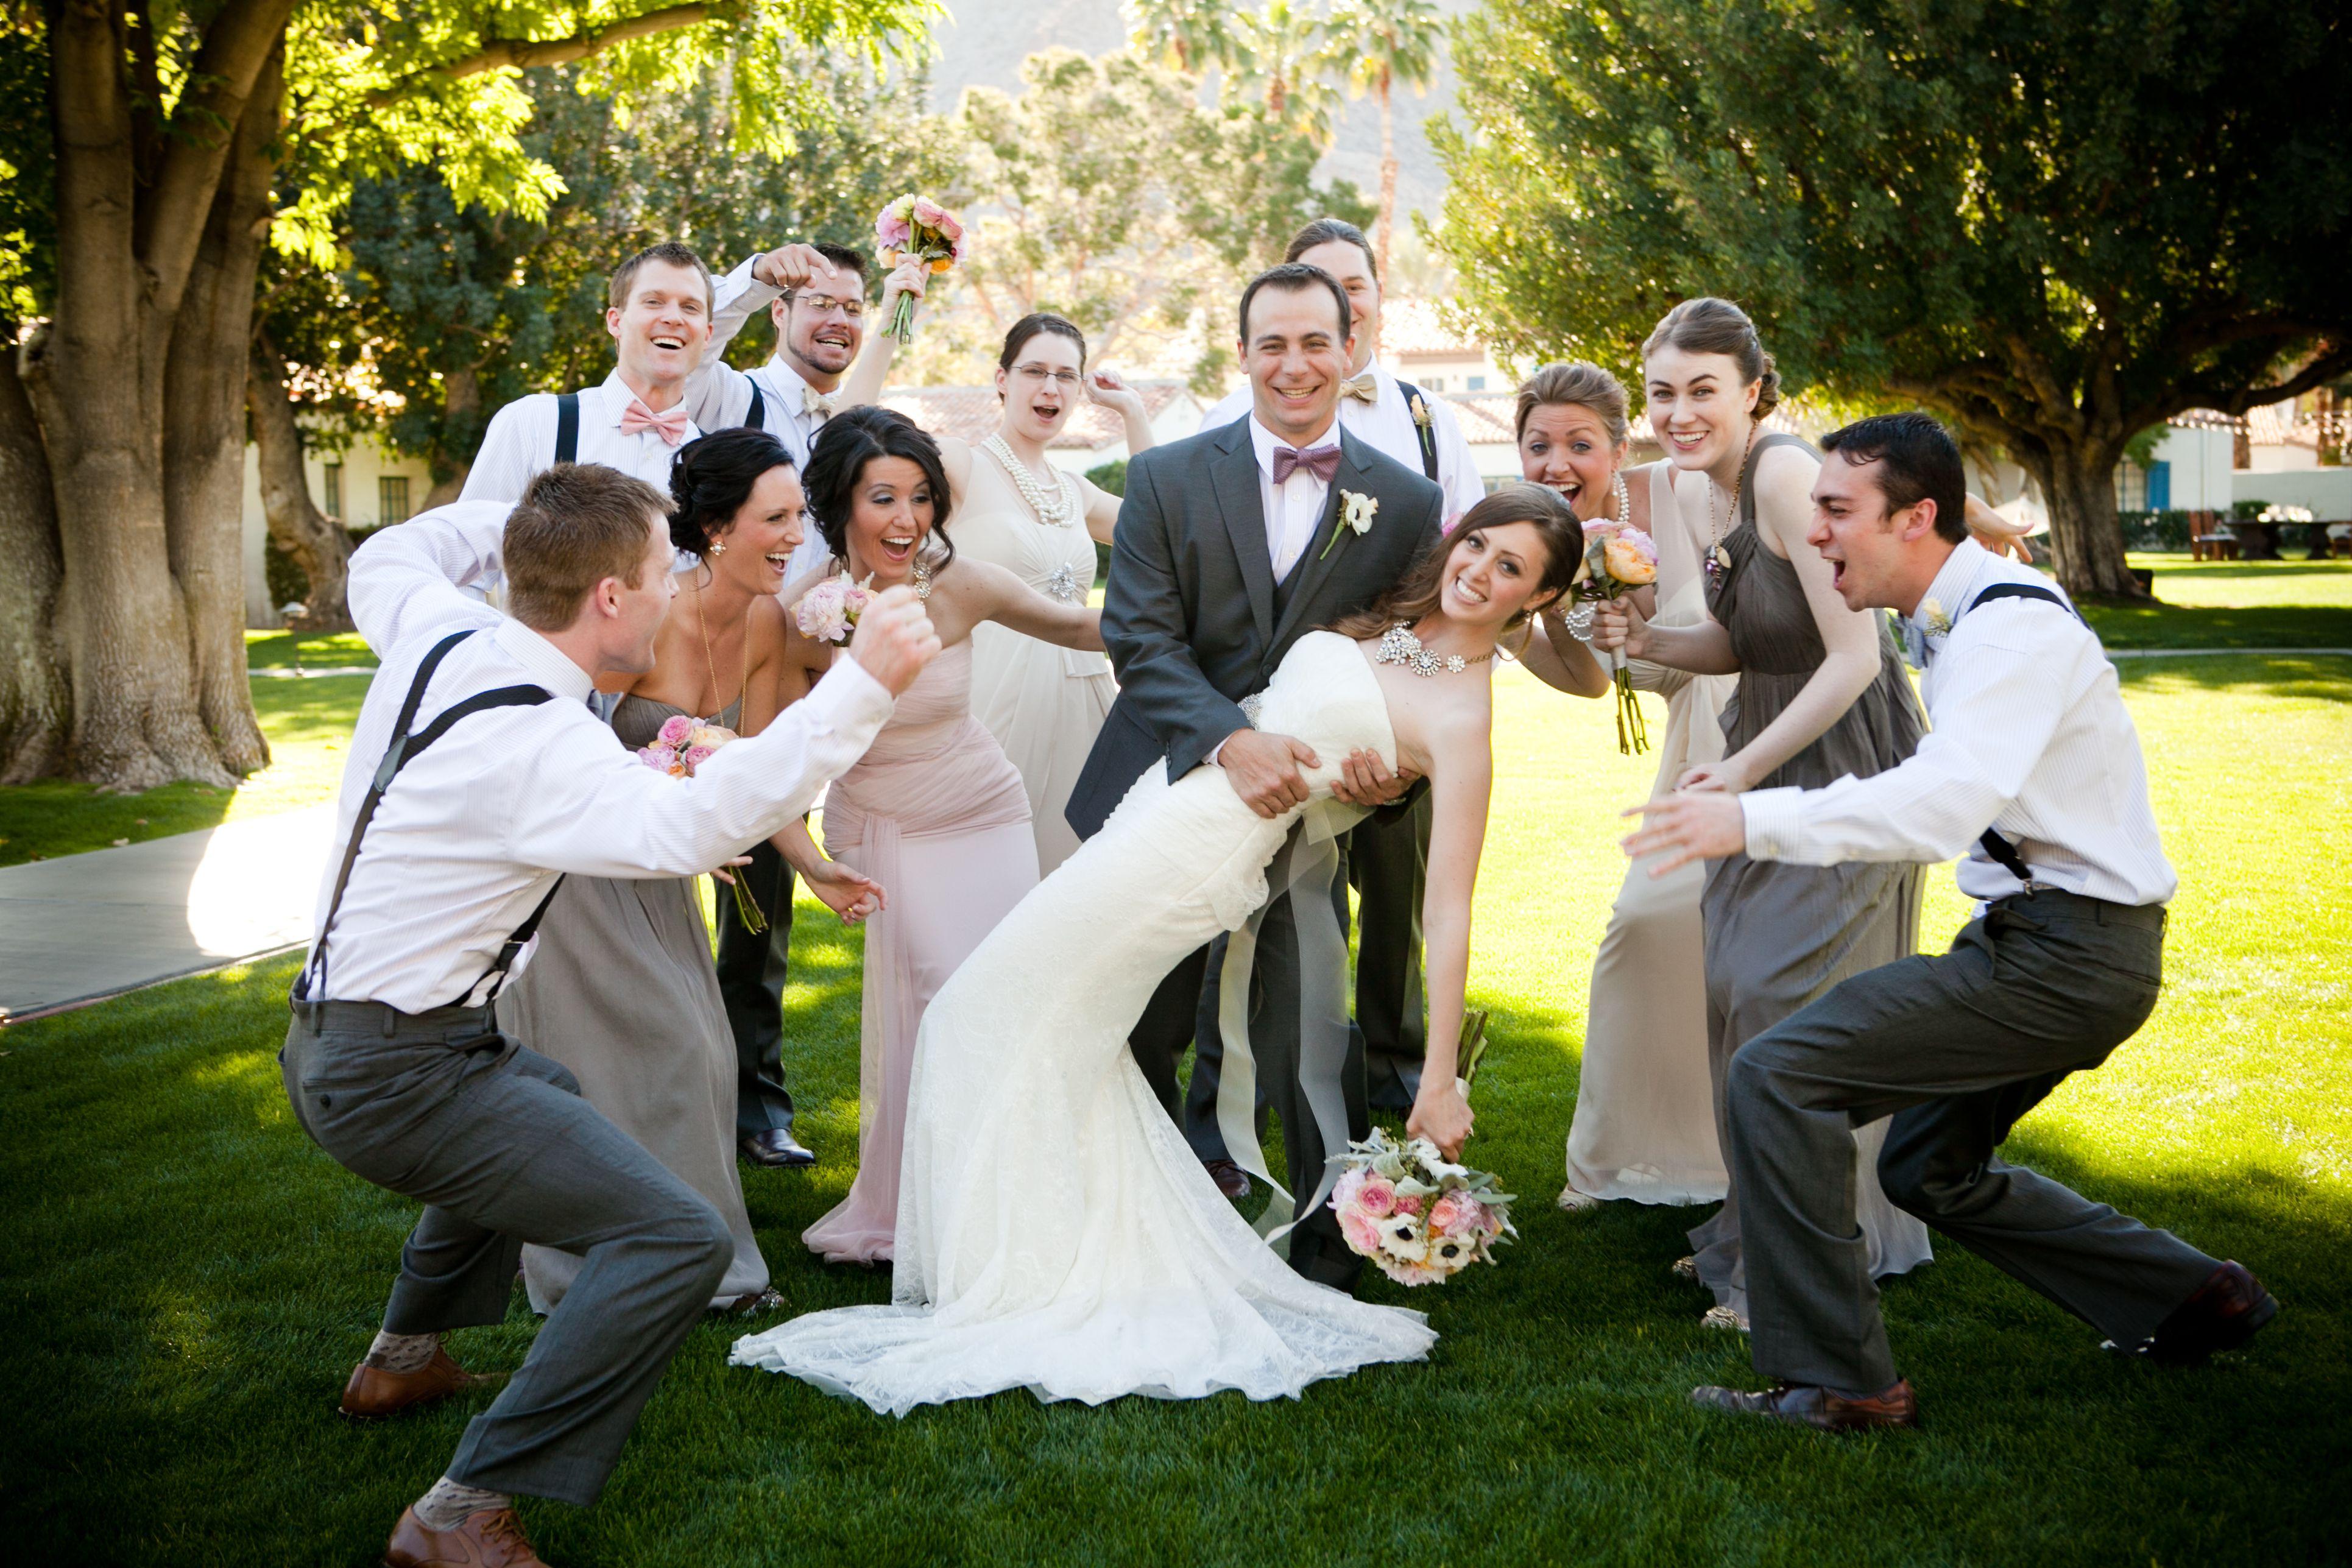 #DesertWedding #LaQuintaResort #ShabbyChic #Bridesmaids #Groomsmen #JCrew #VeraWang #Wedding #VintageStyle